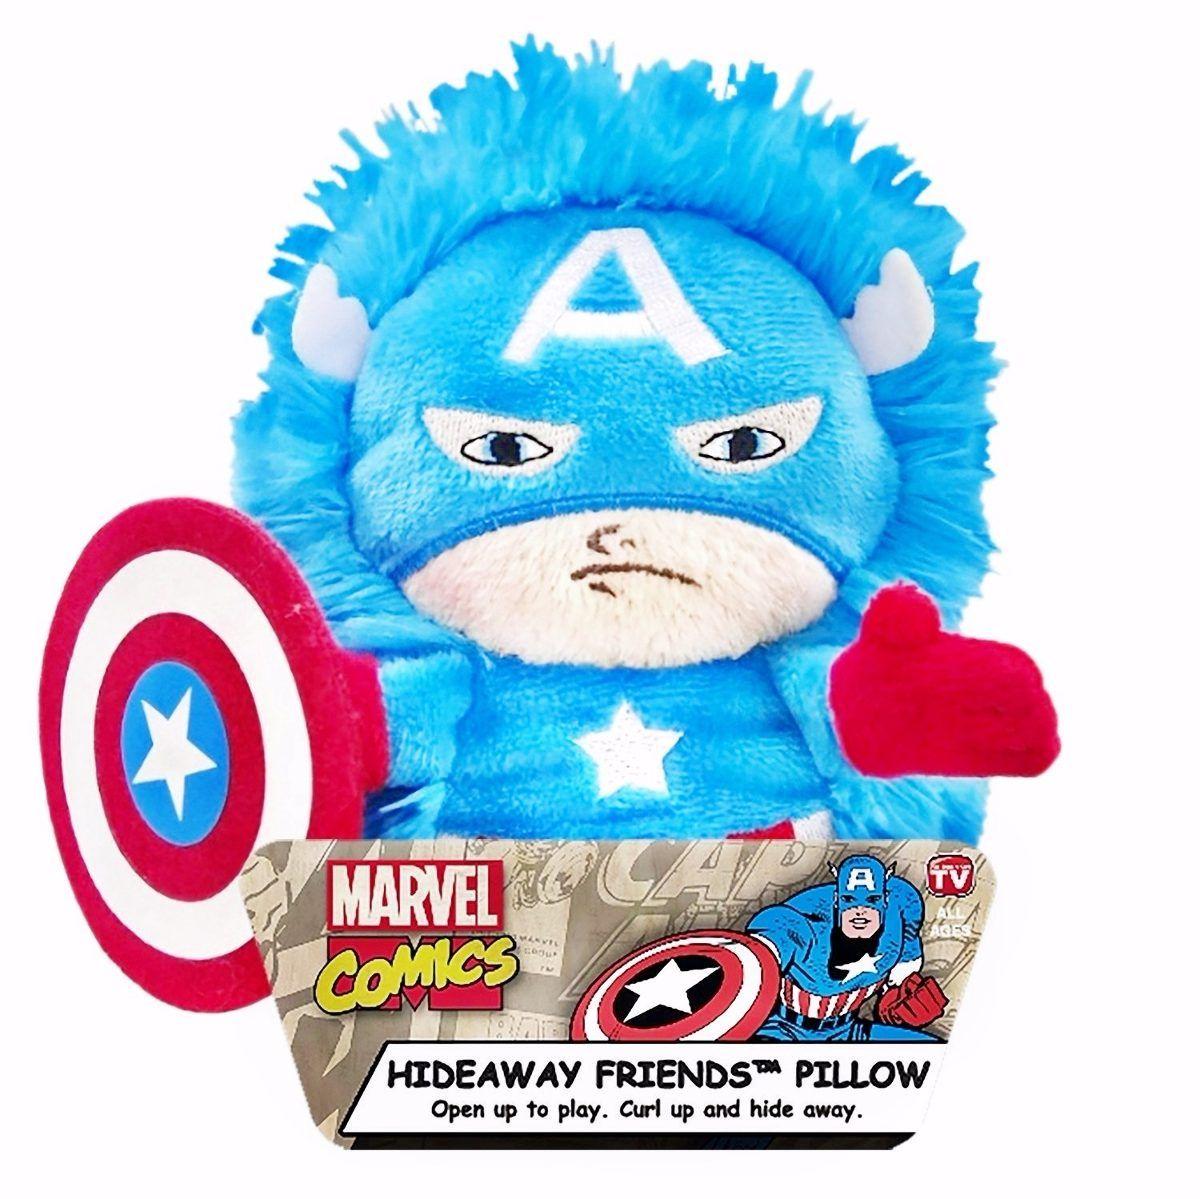 Pelúcia Capitão América: Marvel (Hideaway Pets Pillow) - DTC